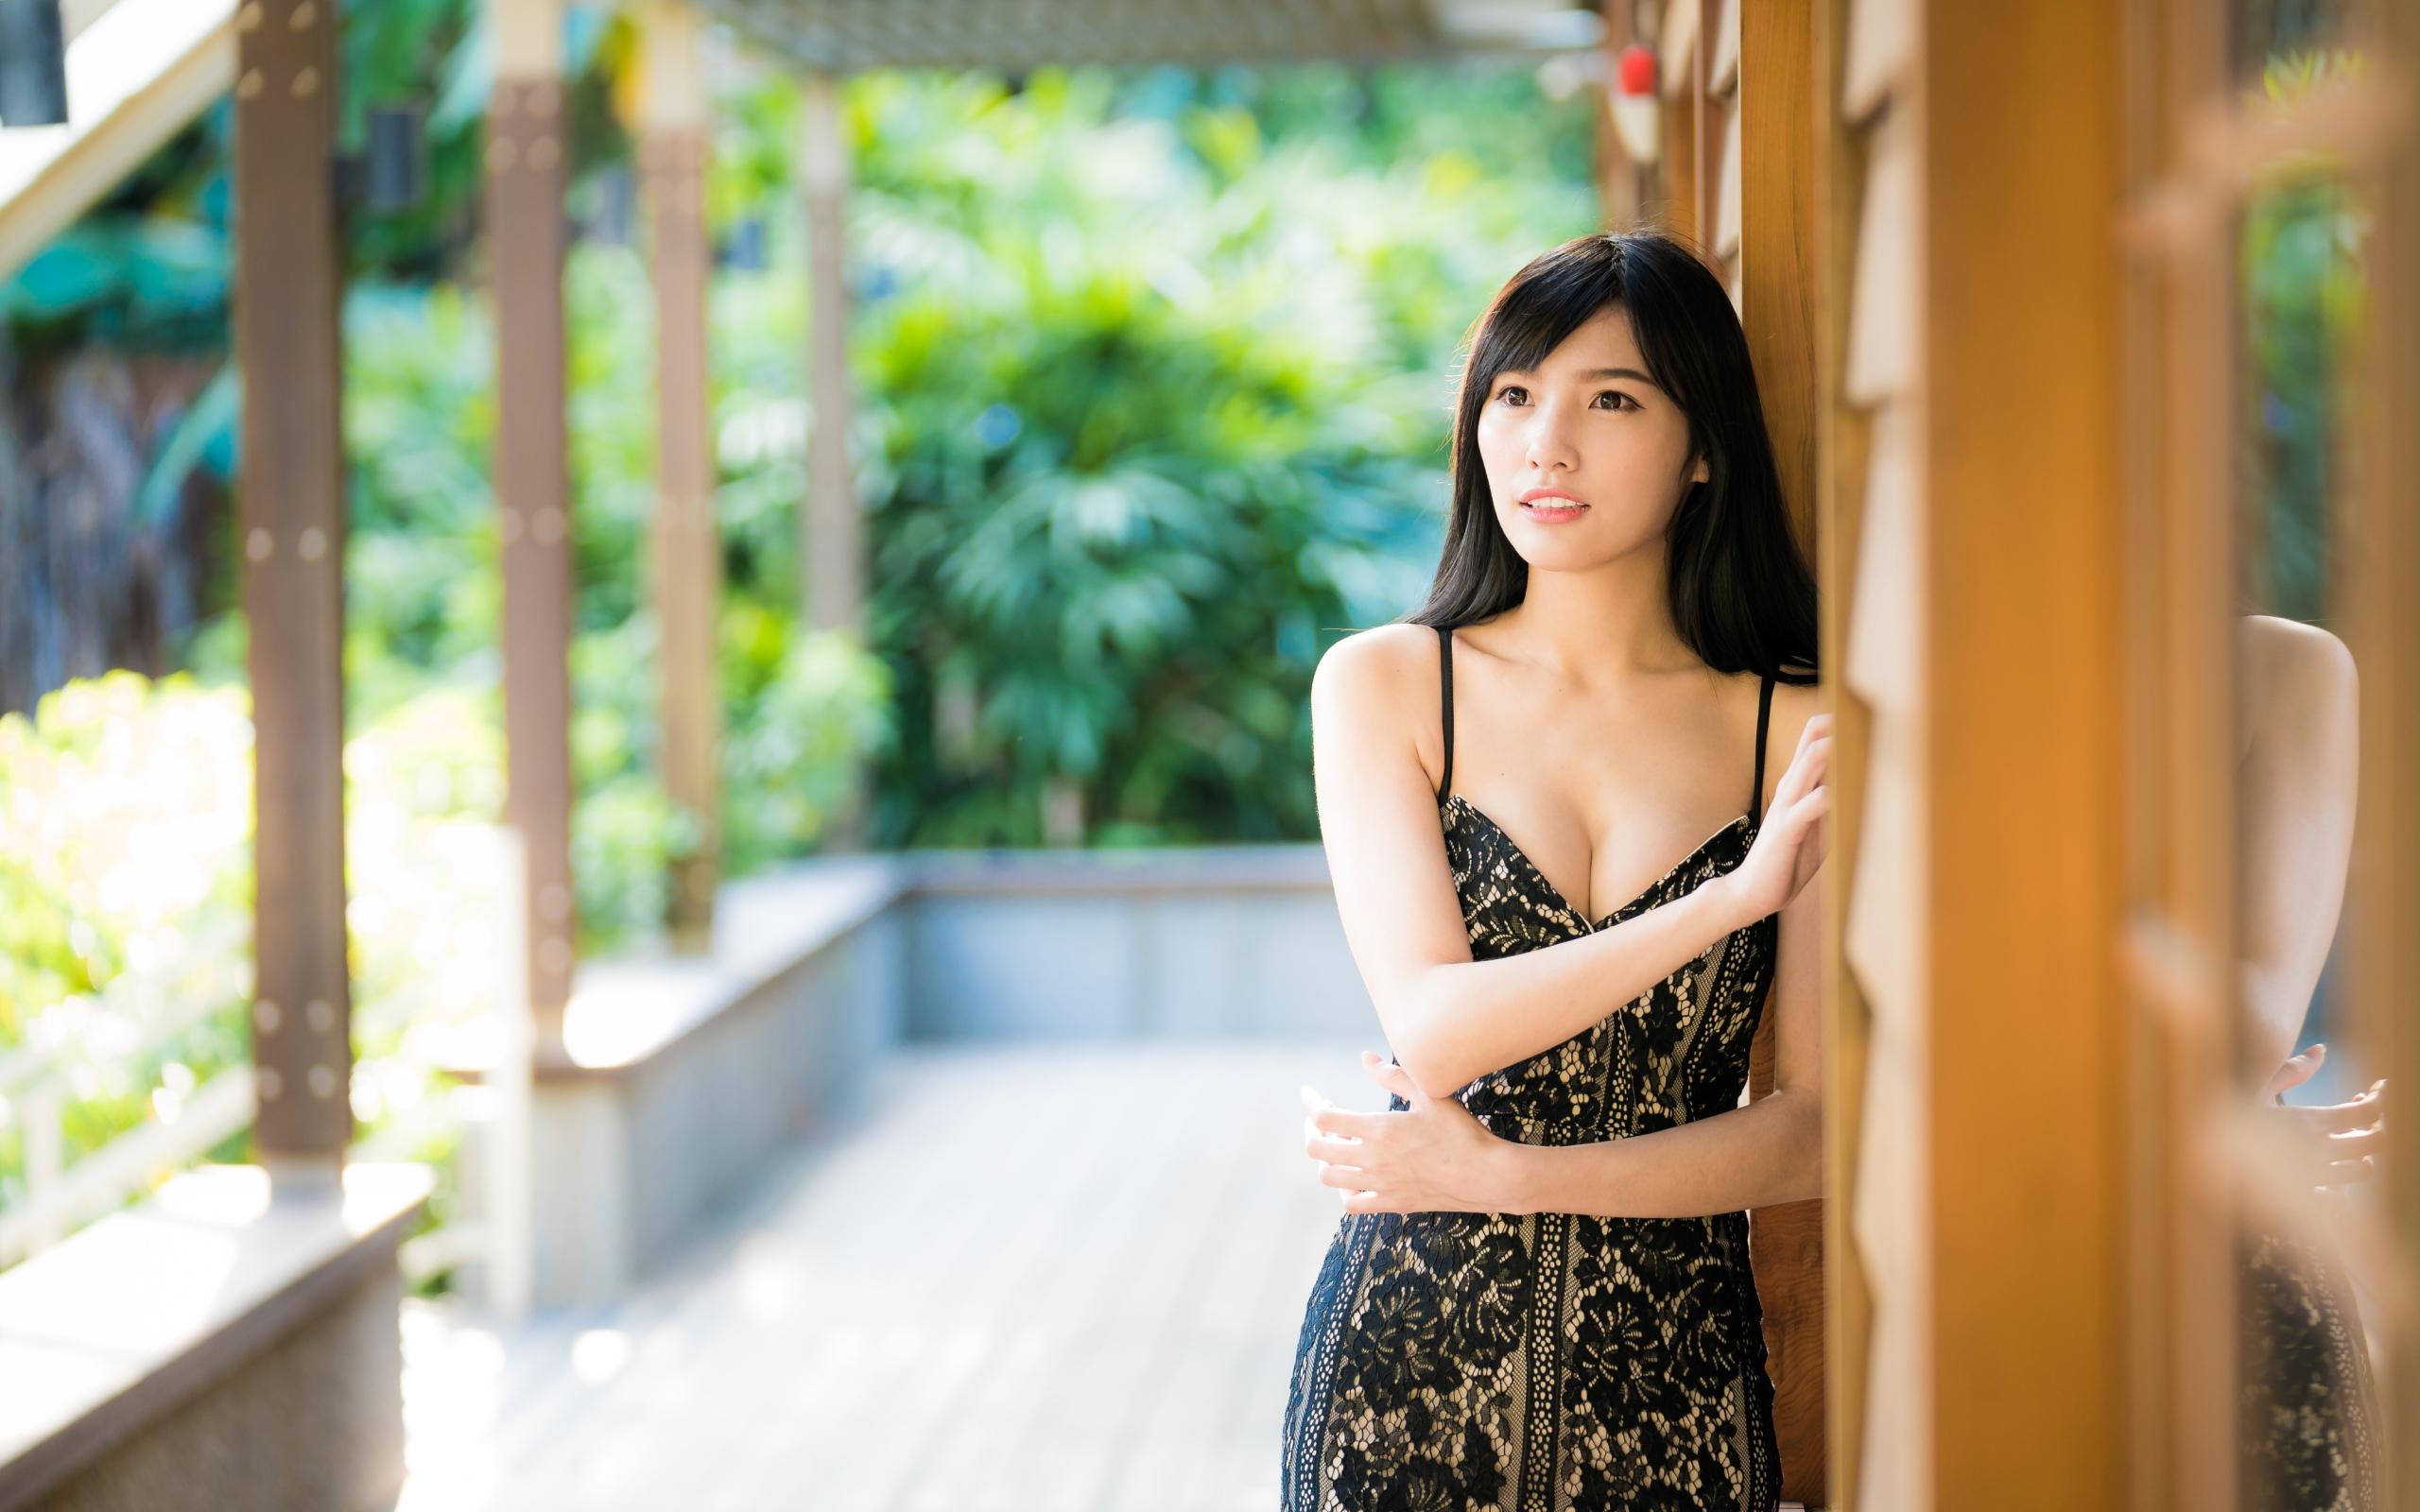 Asian girls hunting girls, junior fake nude